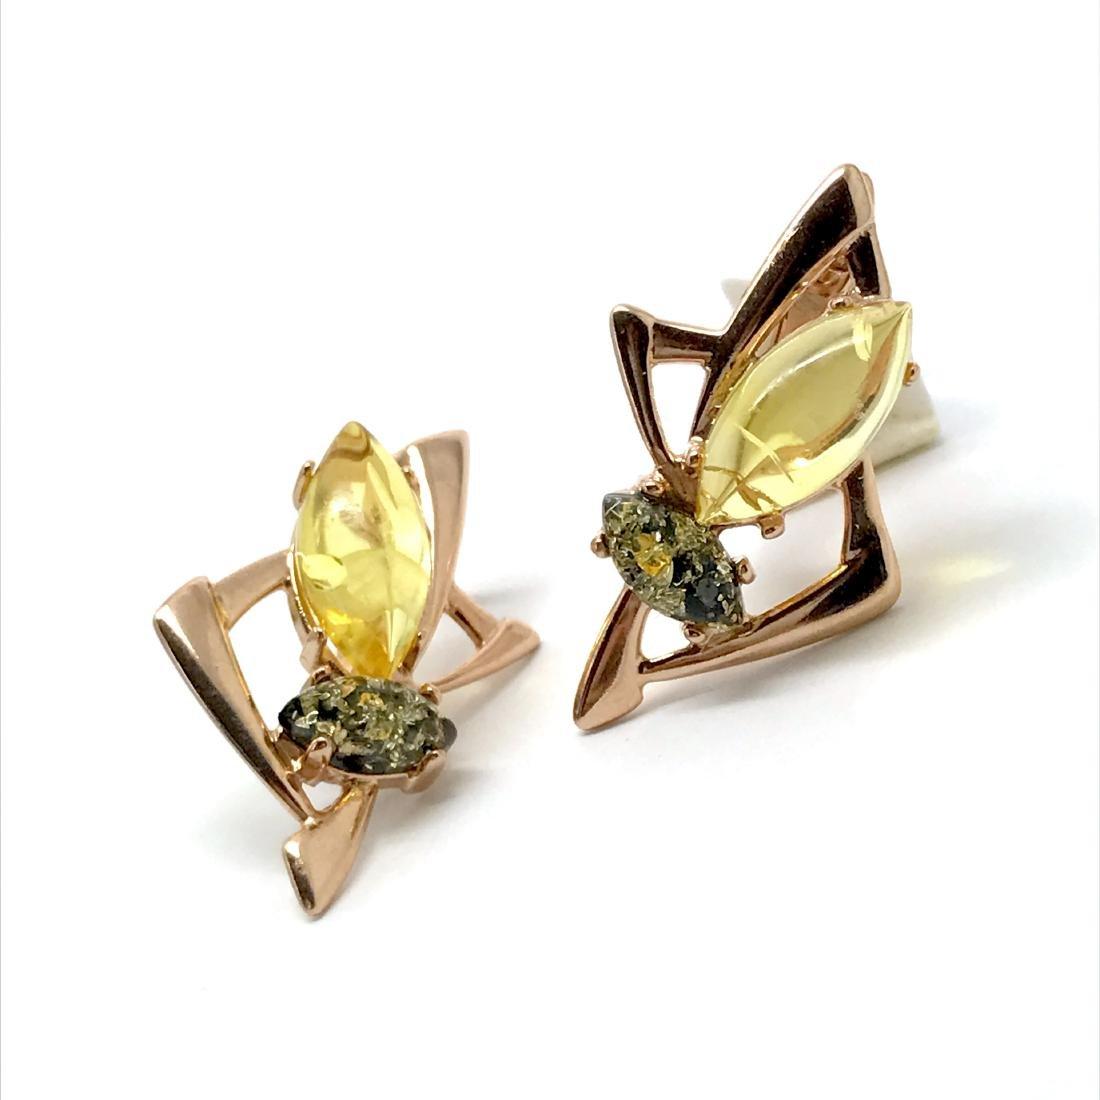 Baltic amber set Ring + Earrings Ag925 goldplated - 9